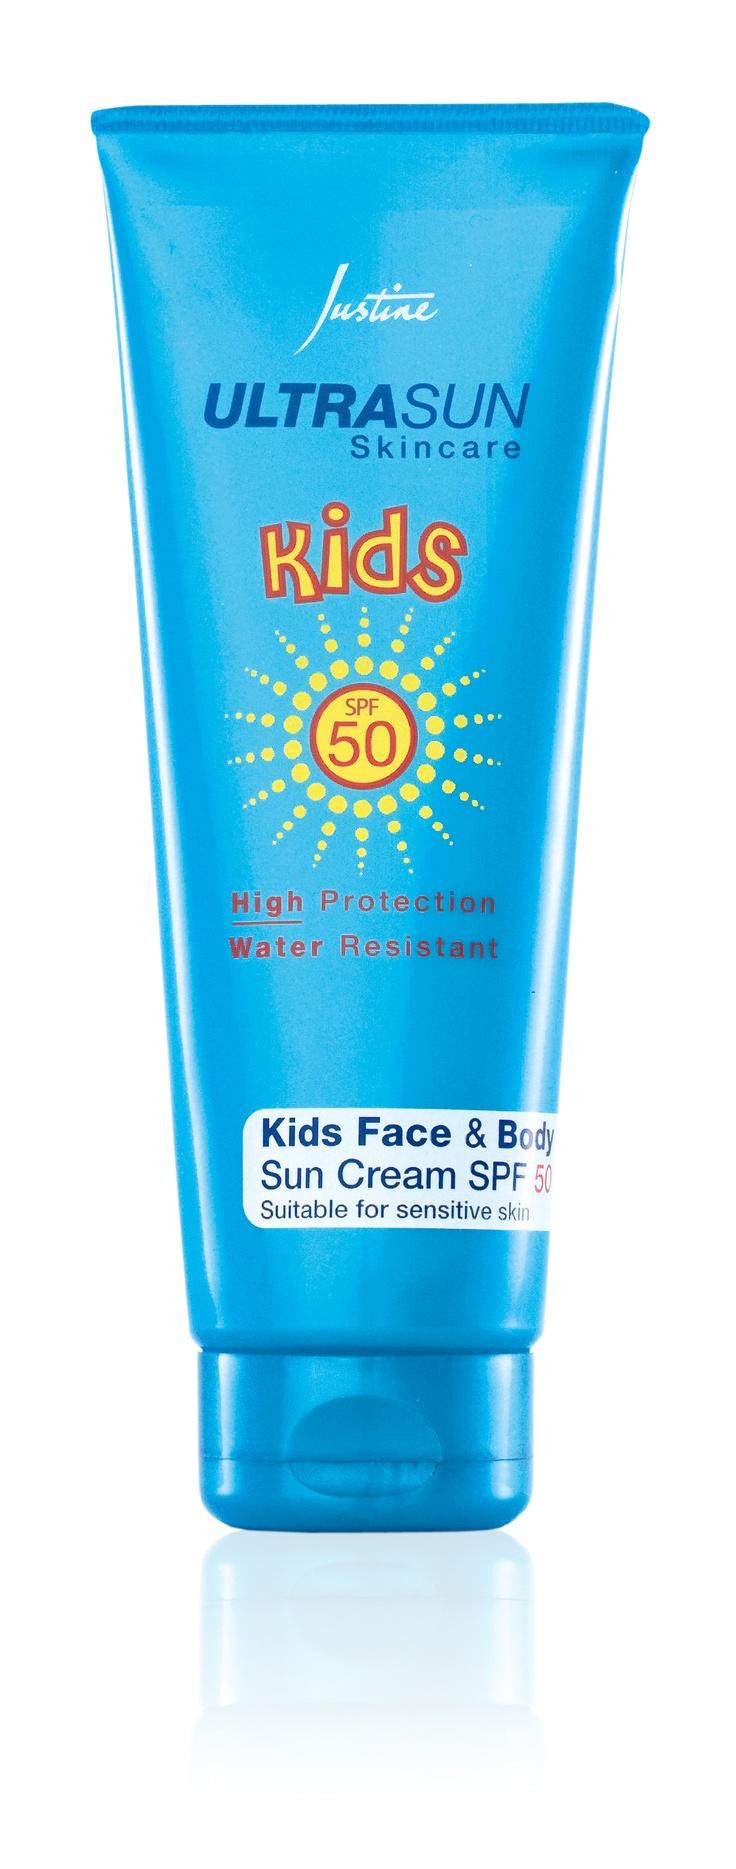 Ultrasun Skincare Kids Face  & Body Sun Cream SPF 50  75 ml   Code 3274  For More Information - http://www.justine.co.za/PRSuite/home_page.page